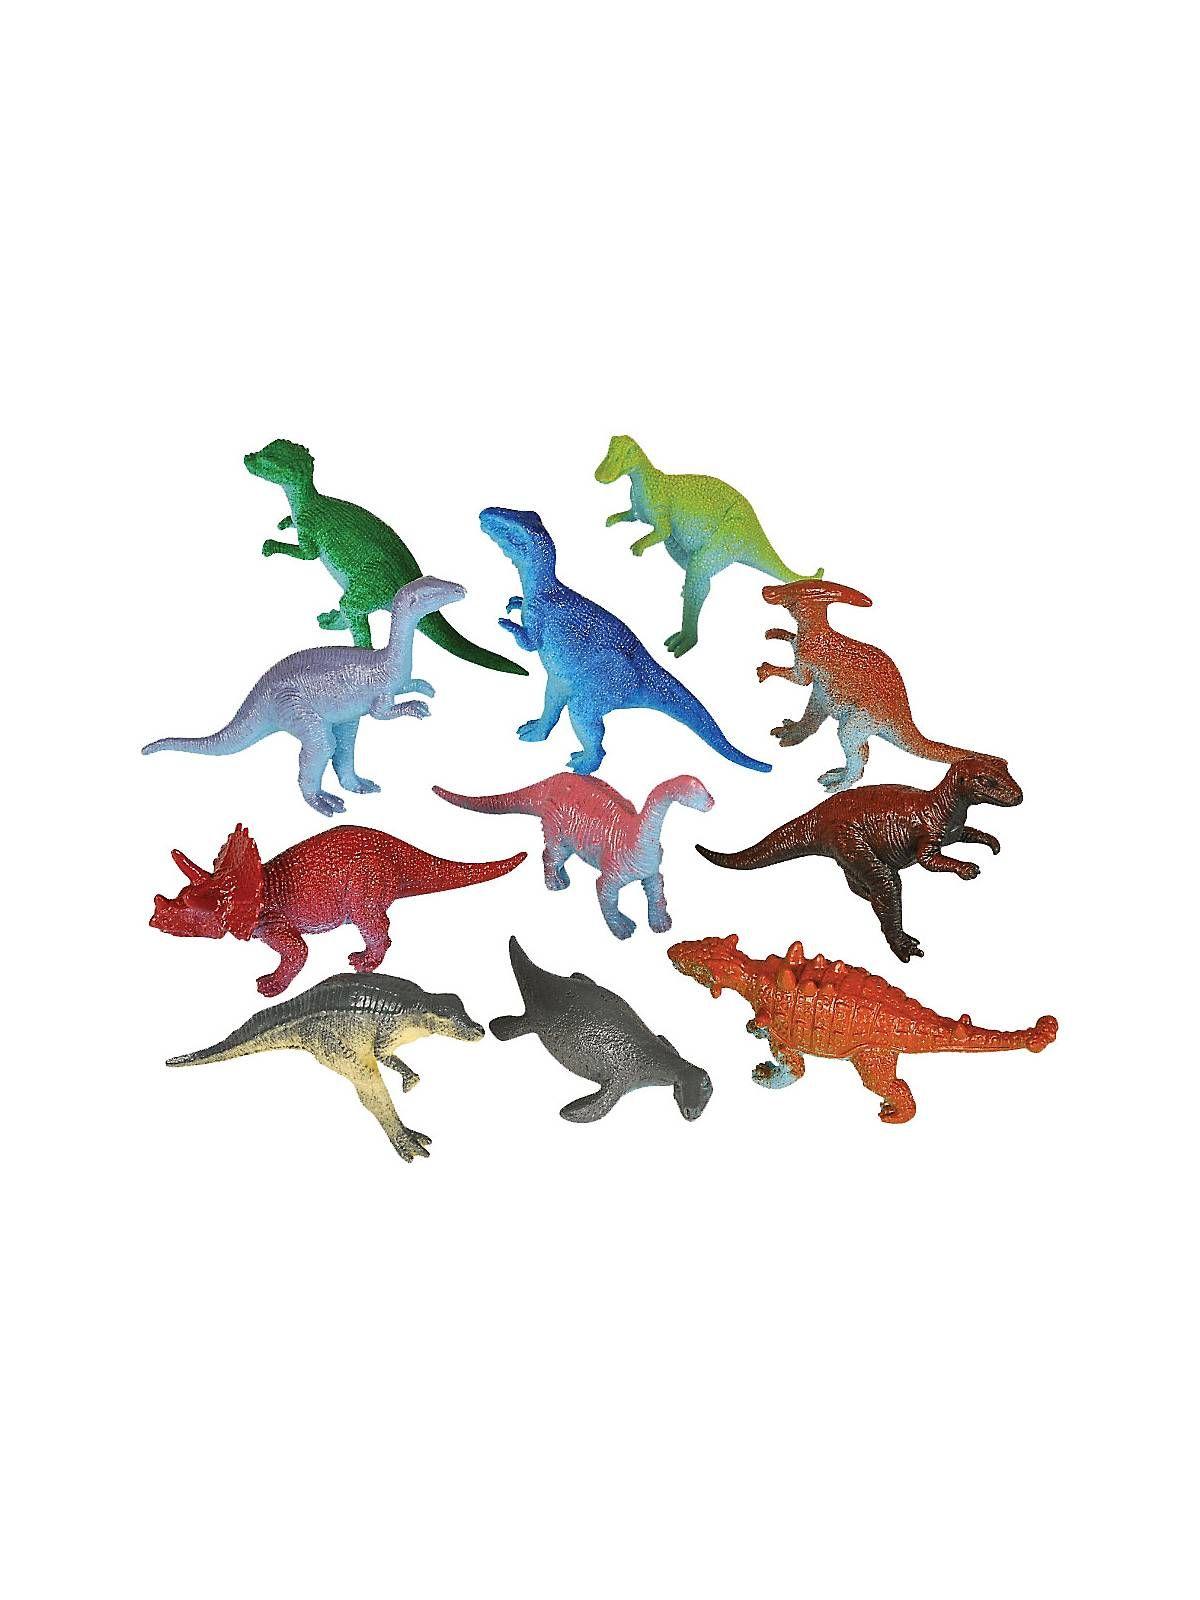 Dinosaur Assortment 2 60 Pack